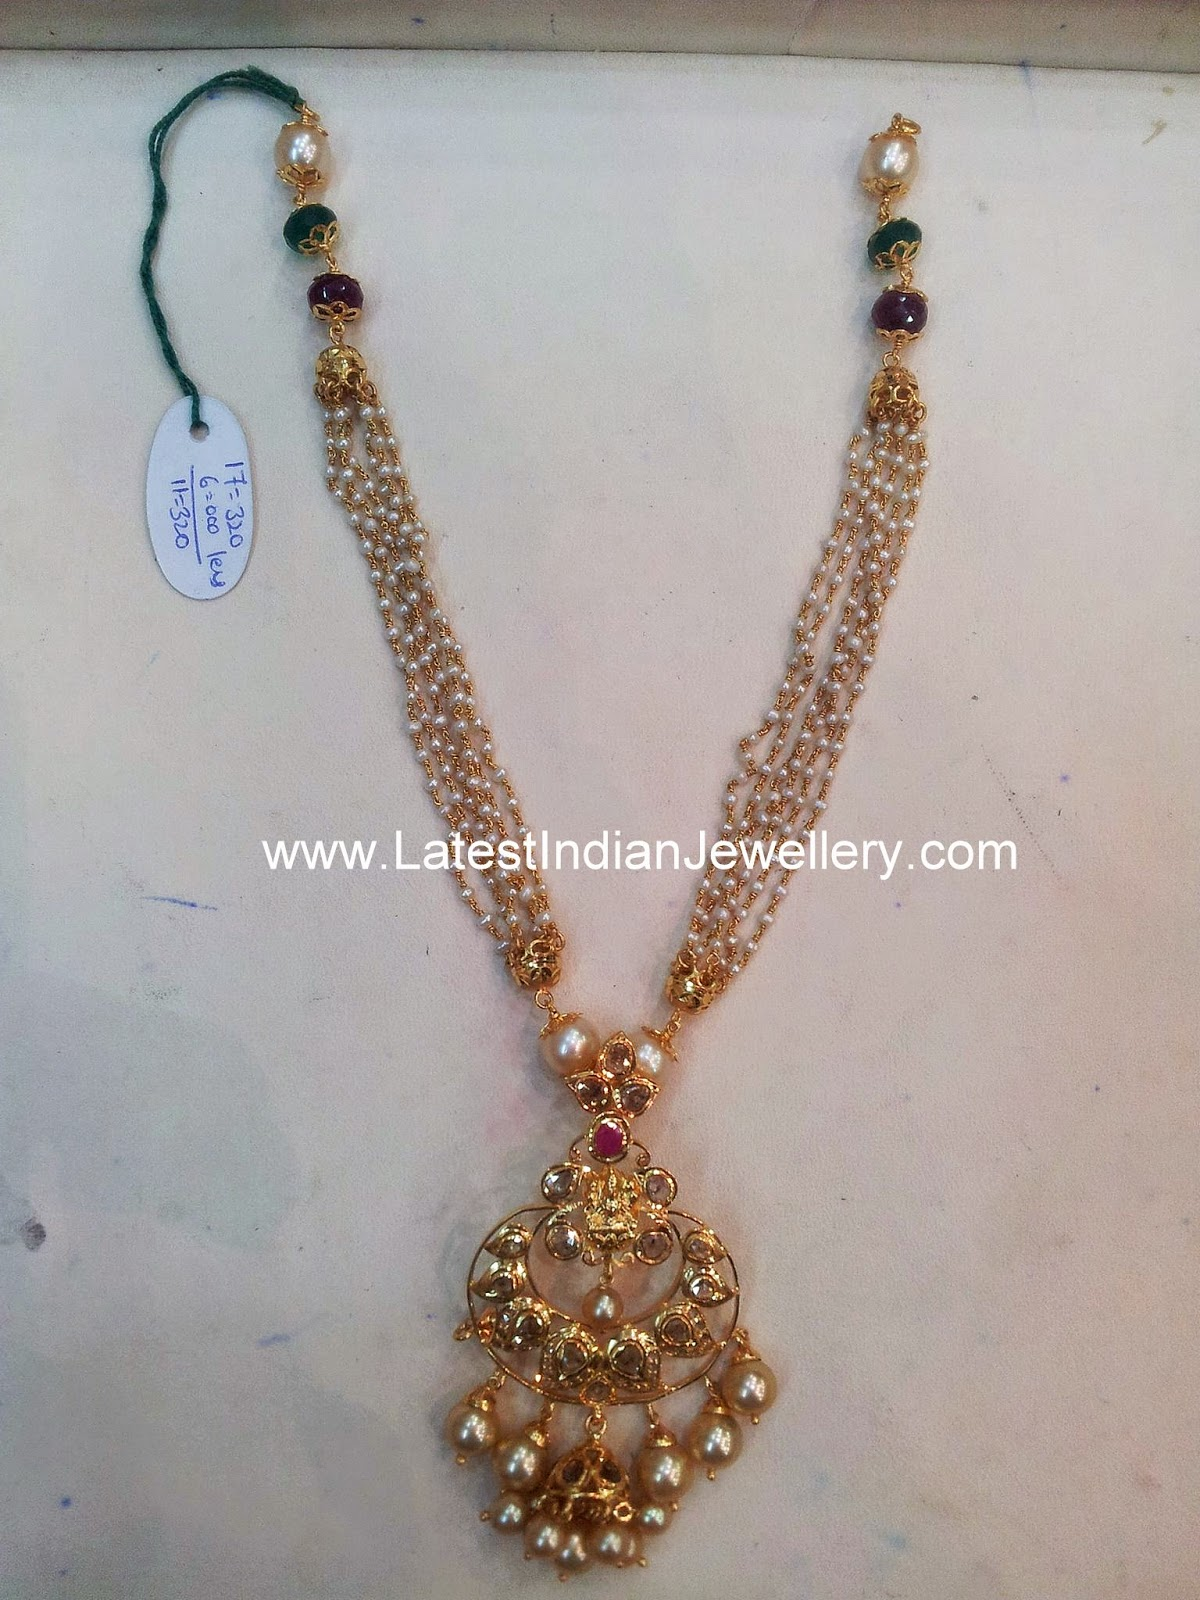 Bali design gold pendant